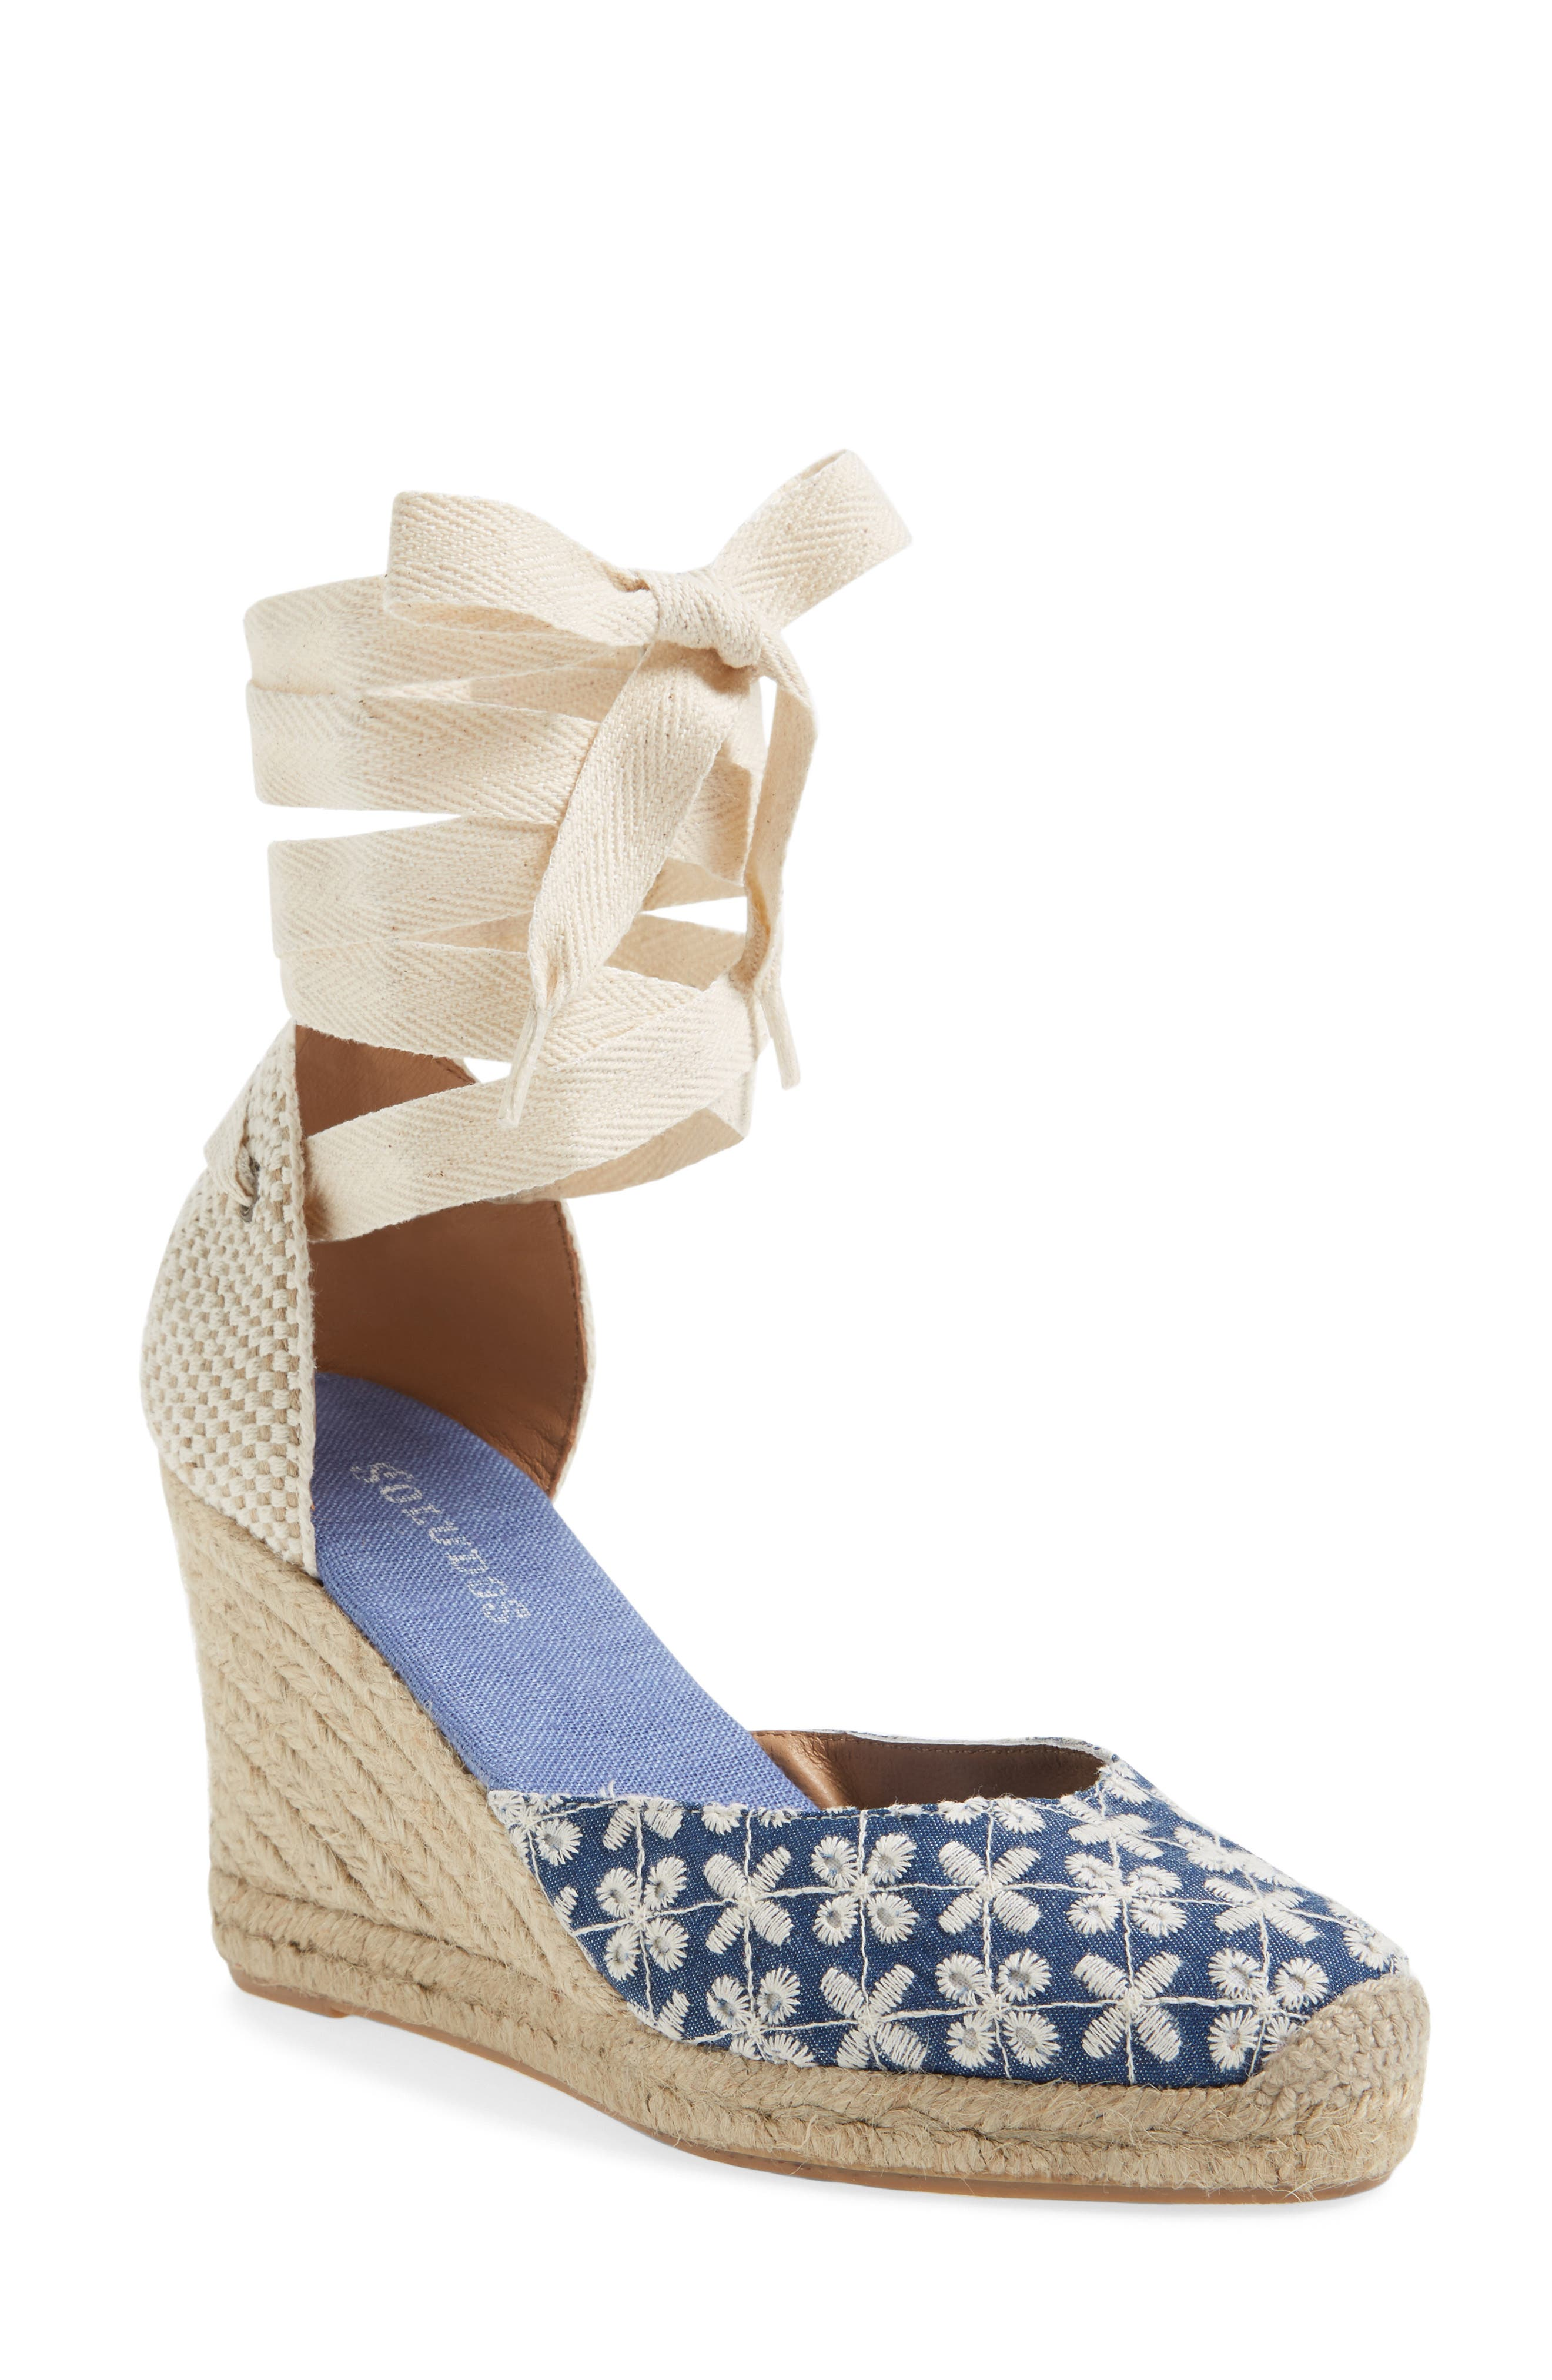 Espadrille Wedge Sandal,                         Main,                         color, 425